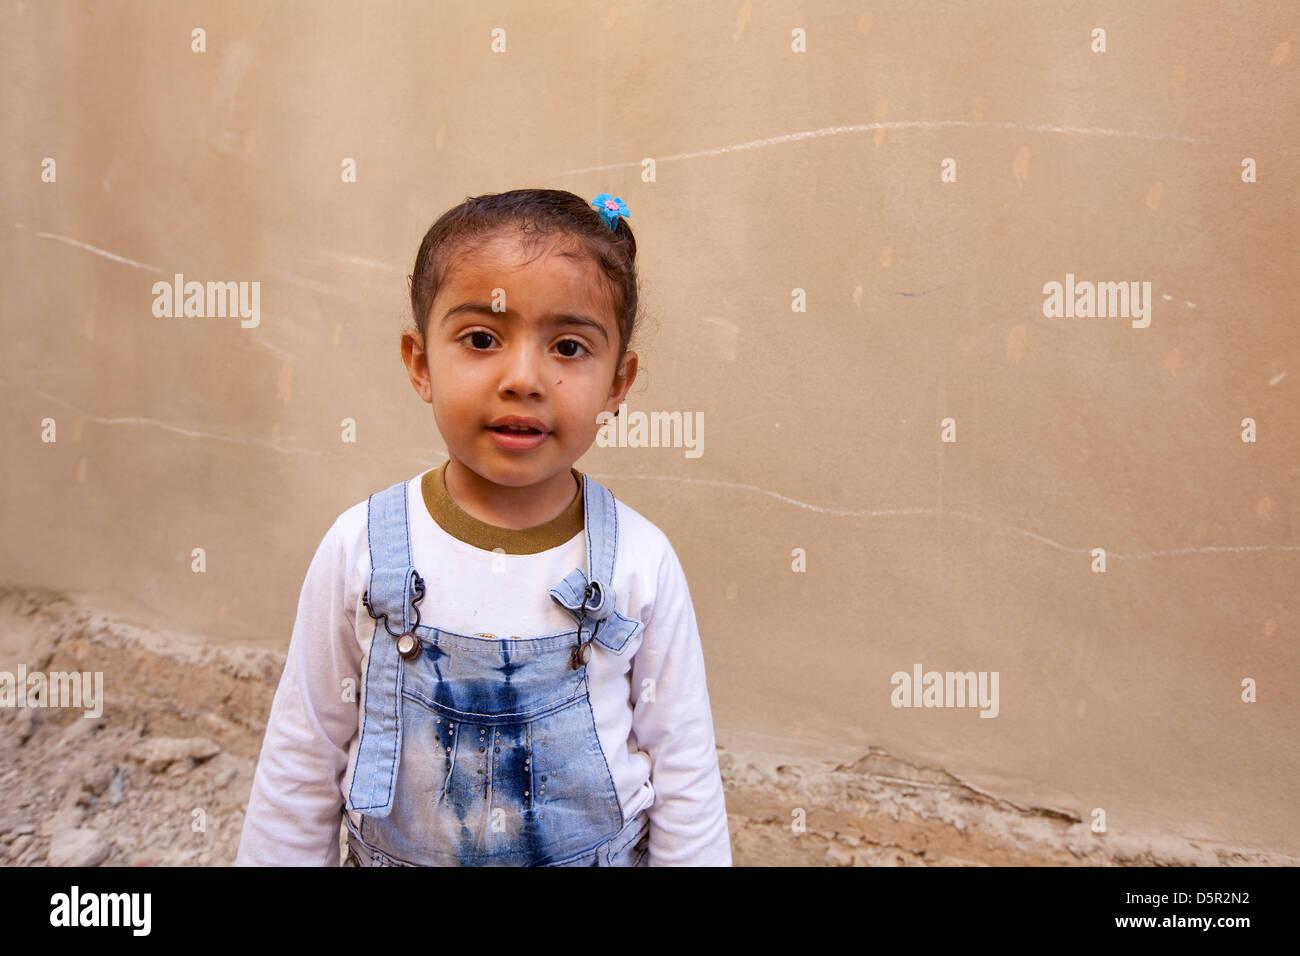 Young Palestinian girl in Berj El Shamel refugee camp, Tyr, Lebanon - Stock Image